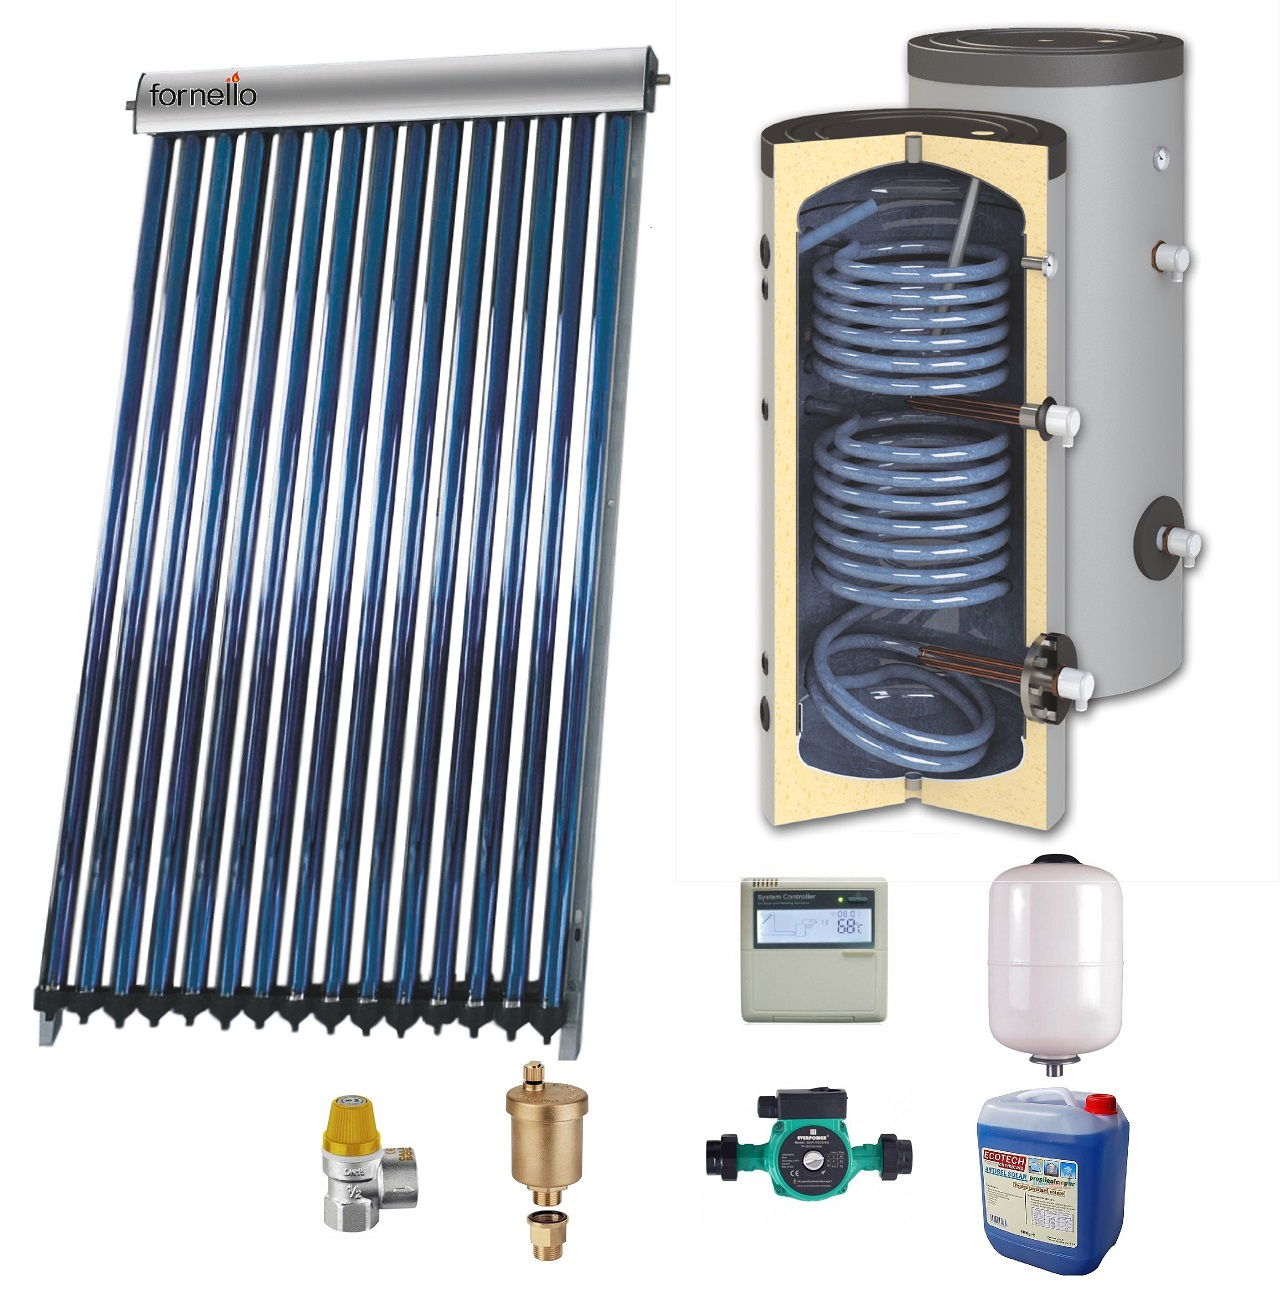 Sistem solar presurizat , panou Sunsystem VTC 30 tuburi, boiler cu 2 serpentine si rezistenta electrica Sunsystem SON 200 litri, pompa 25-60, controller, vas expansiune, antigel, supapa 1/2, aerisitor 1/2 fornello imagine